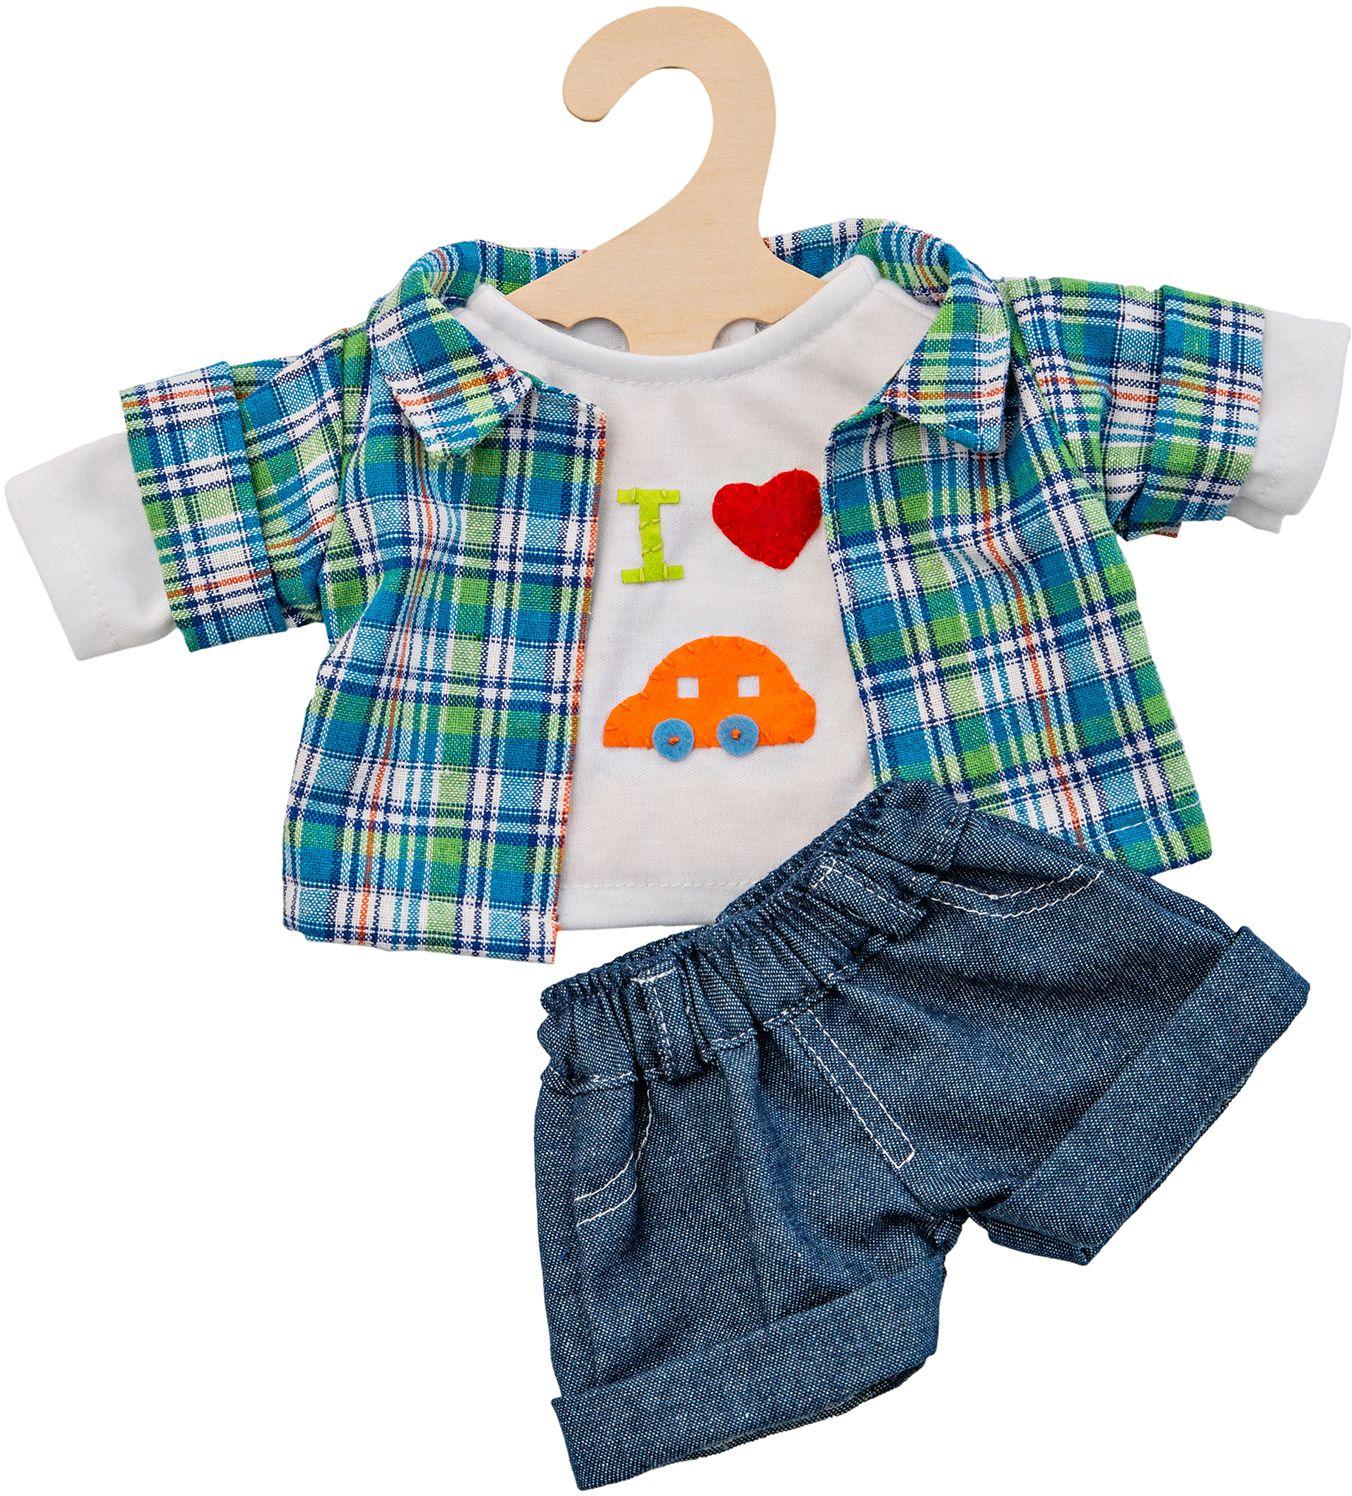 HELESS® Heless® Puppenkleidung Größe 28-35 cm o. 35-45 cm, »Jeansshorts mit Hemd« (3tlg.)